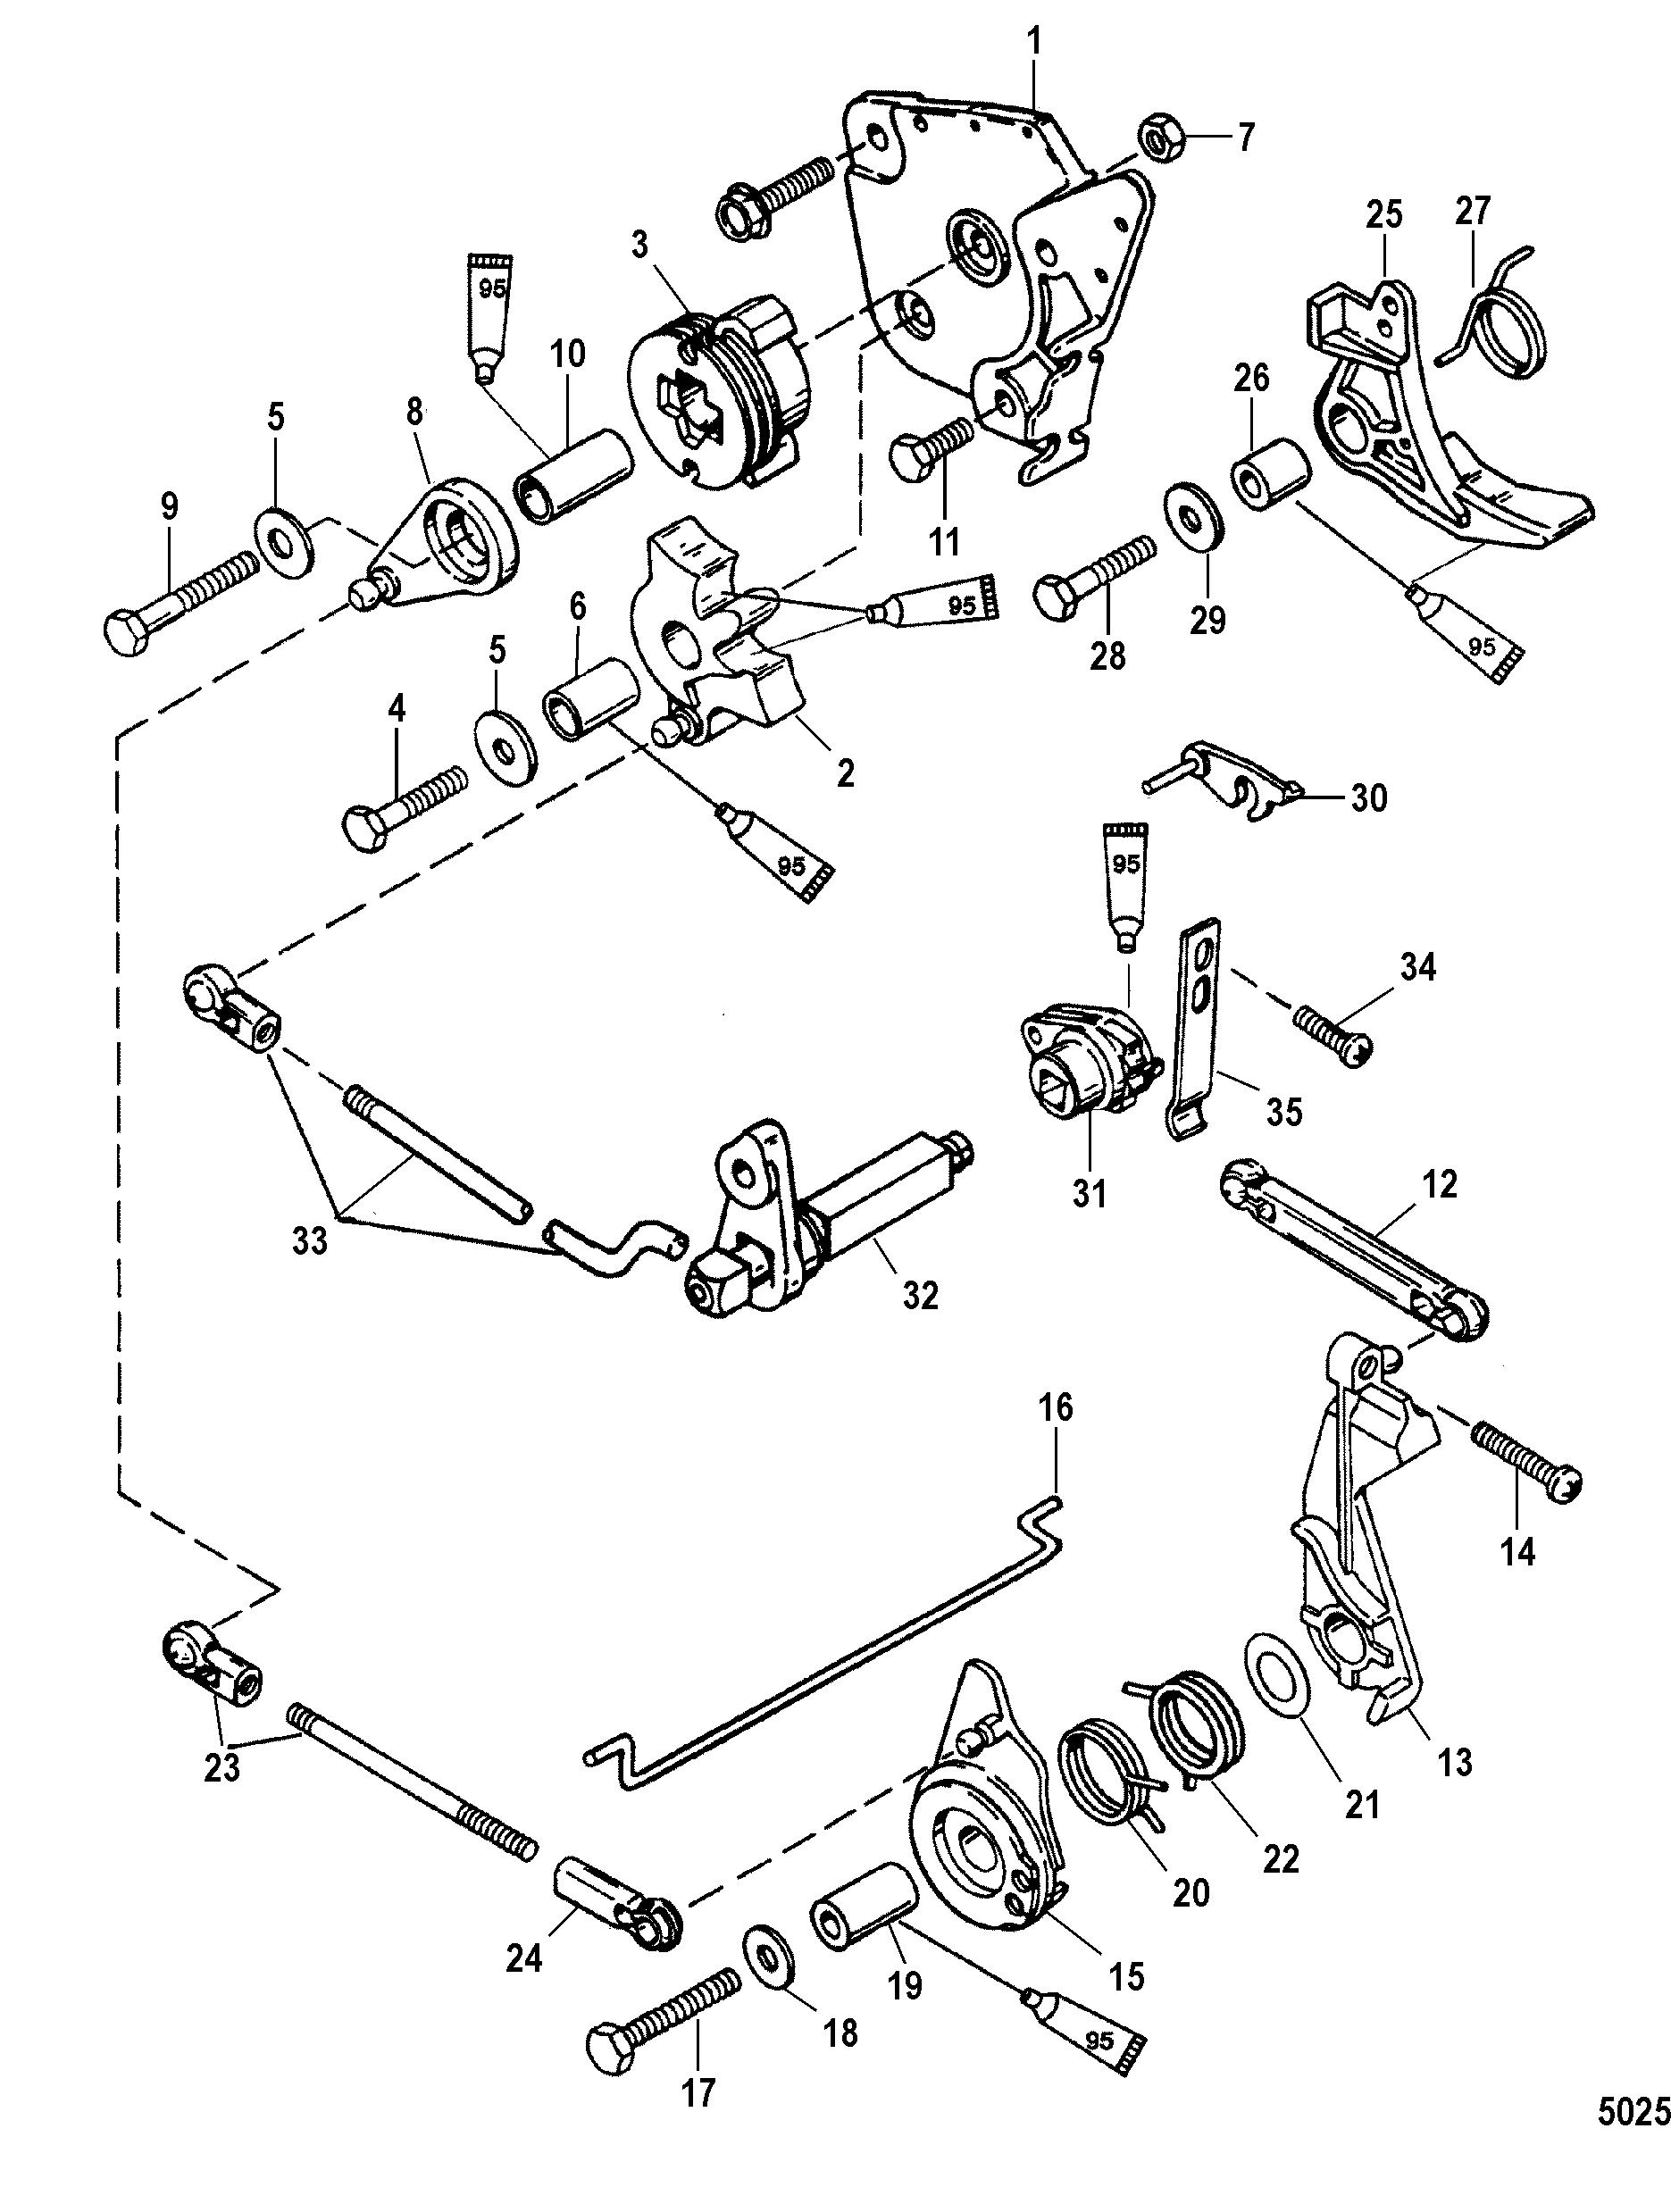 Throttle and Shift Linkage Tiller Handle FOR MARINER